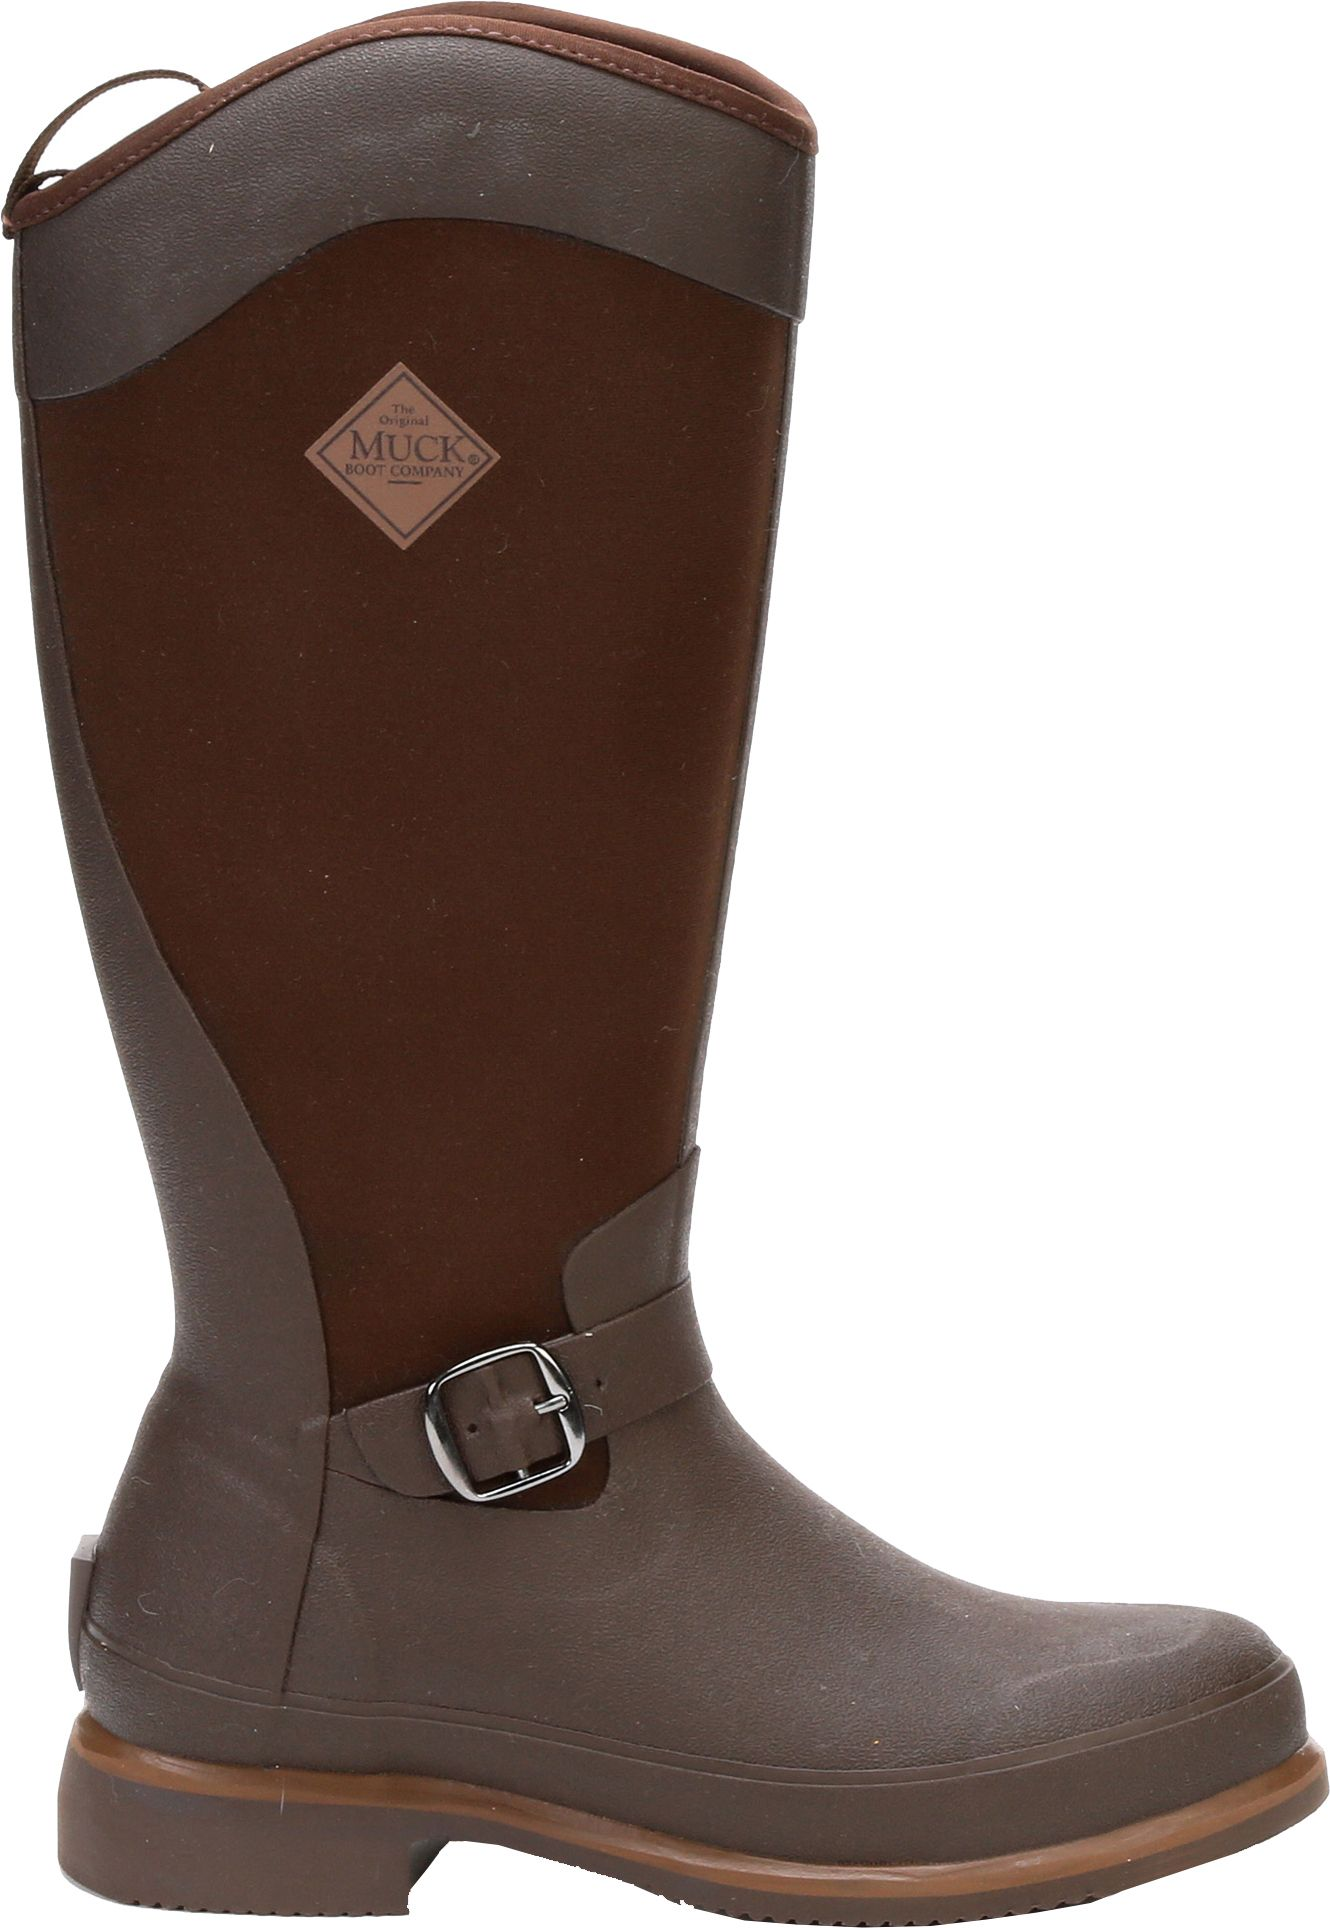 Muck Boots Women's Reign Waterproof Rubber Boots, Size: 11.0, Brown thumbnail